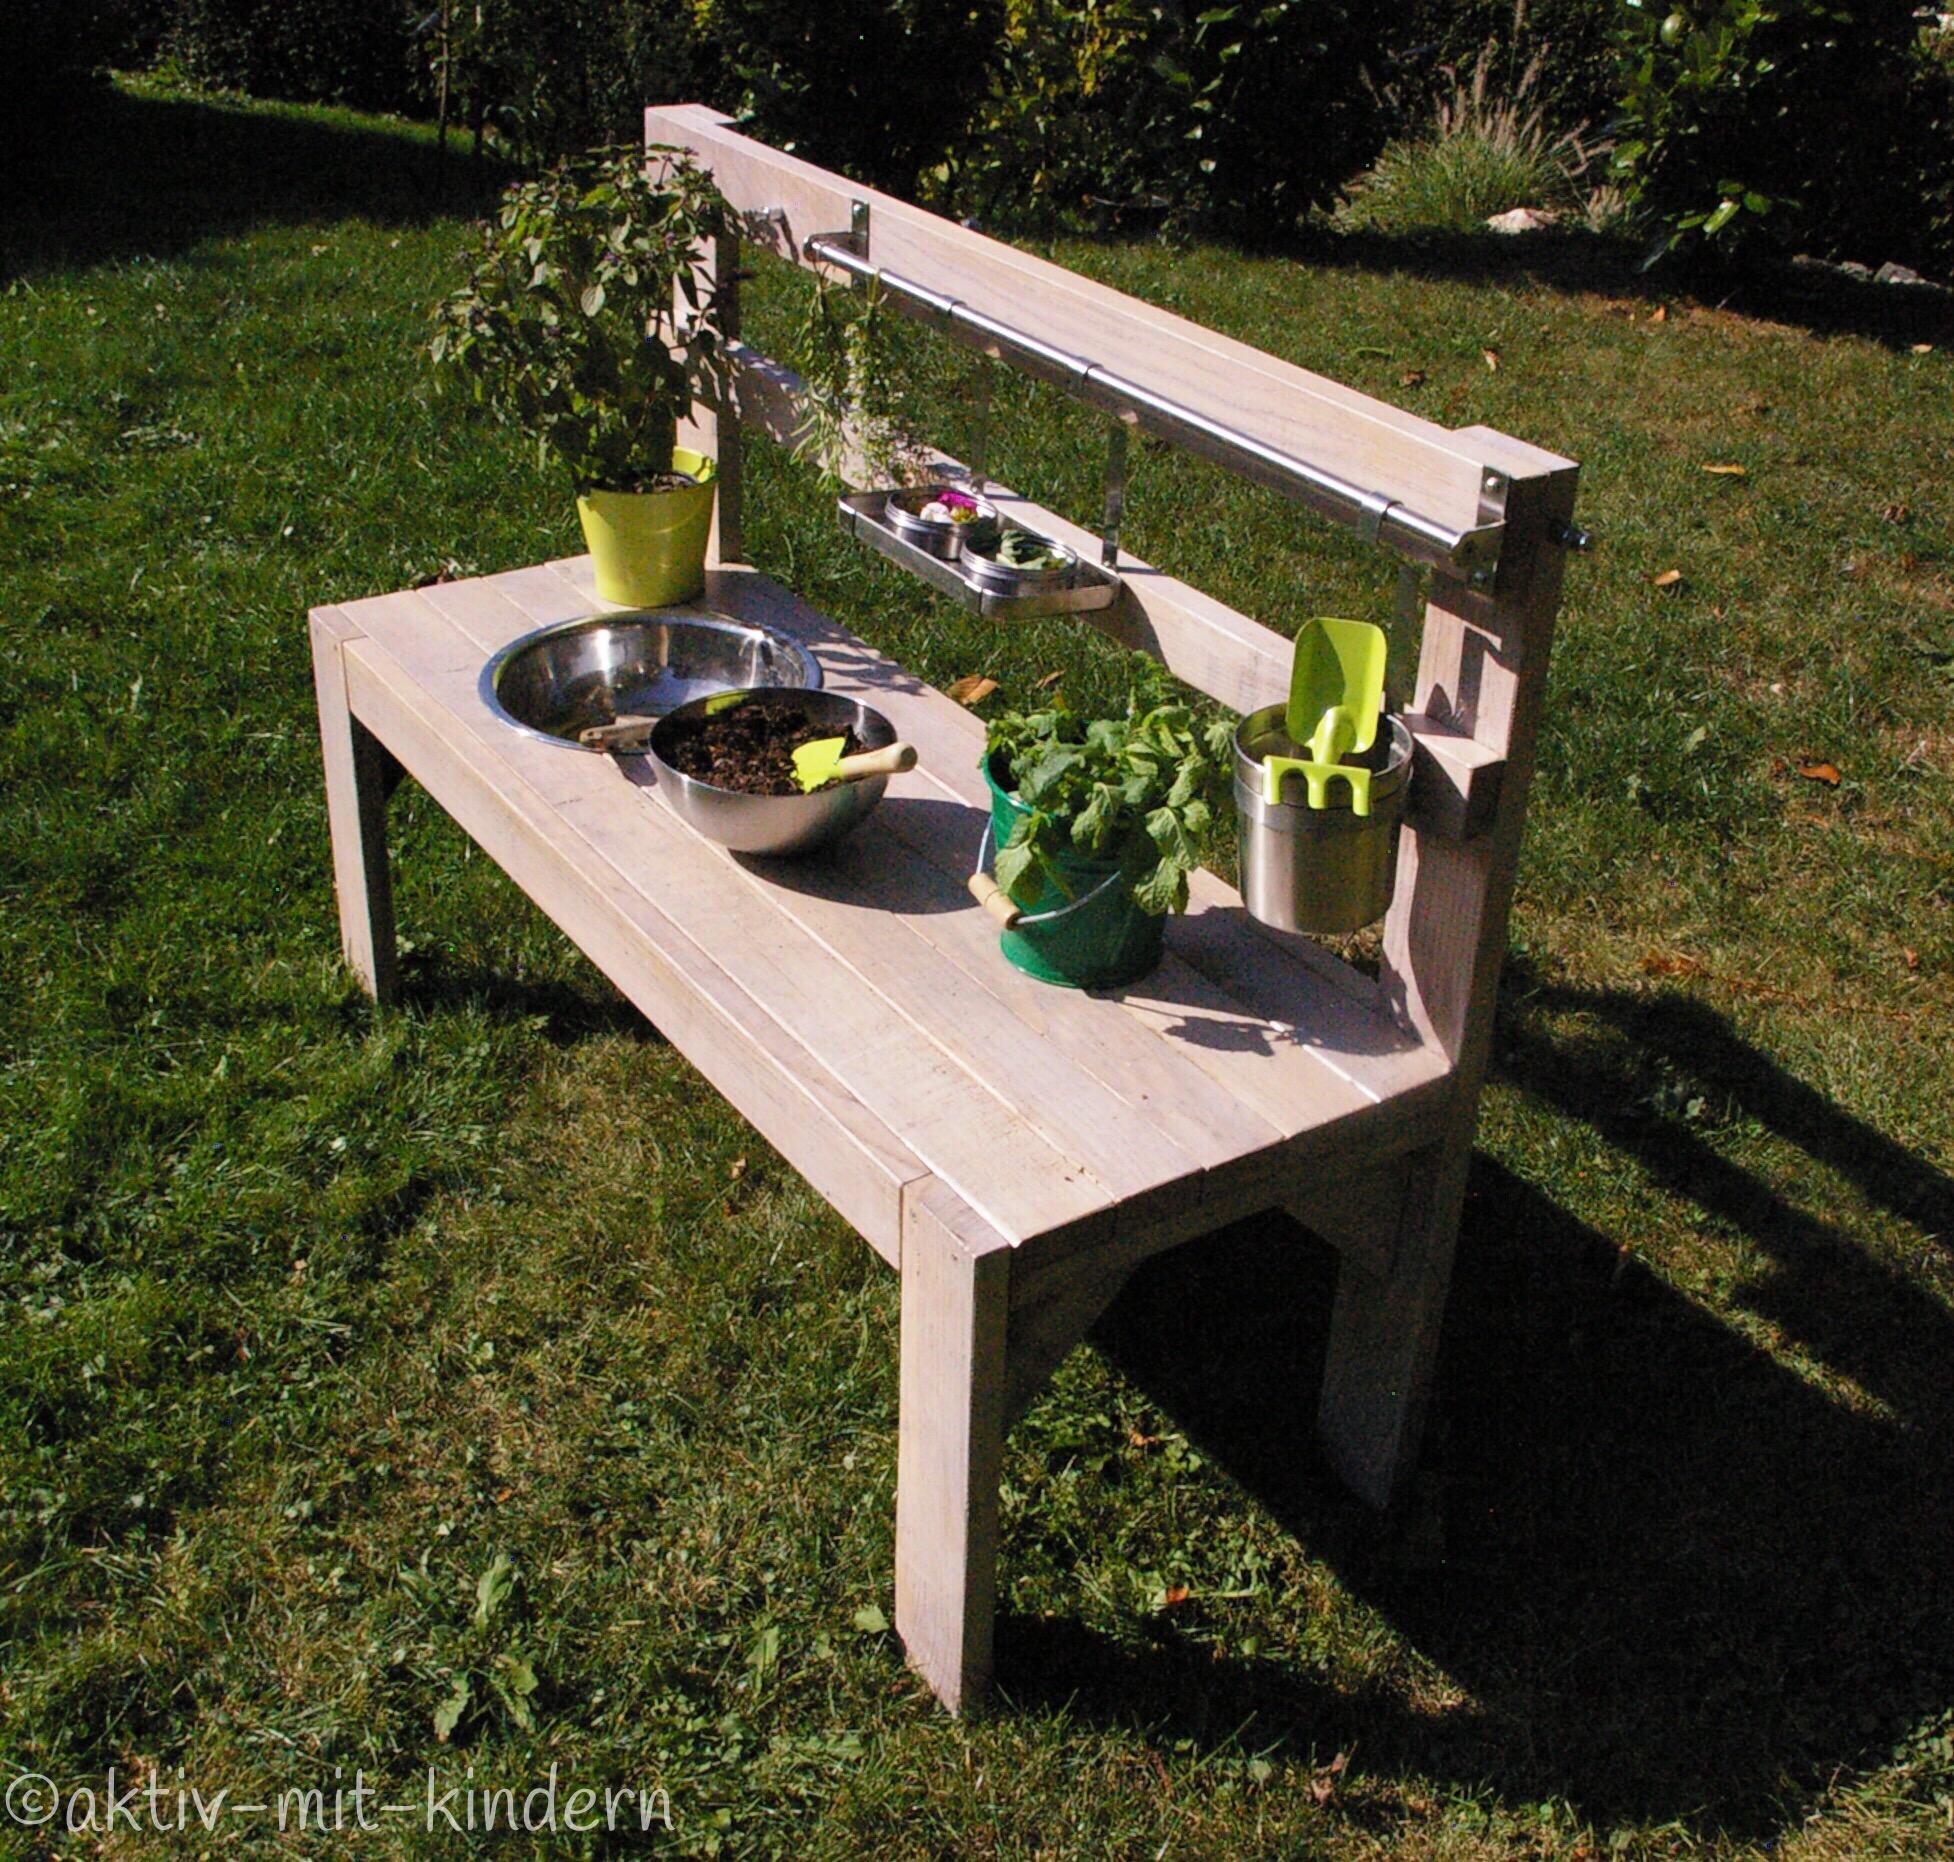 diy unsere matschk che aktiv mit kindern. Black Bedroom Furniture Sets. Home Design Ideas